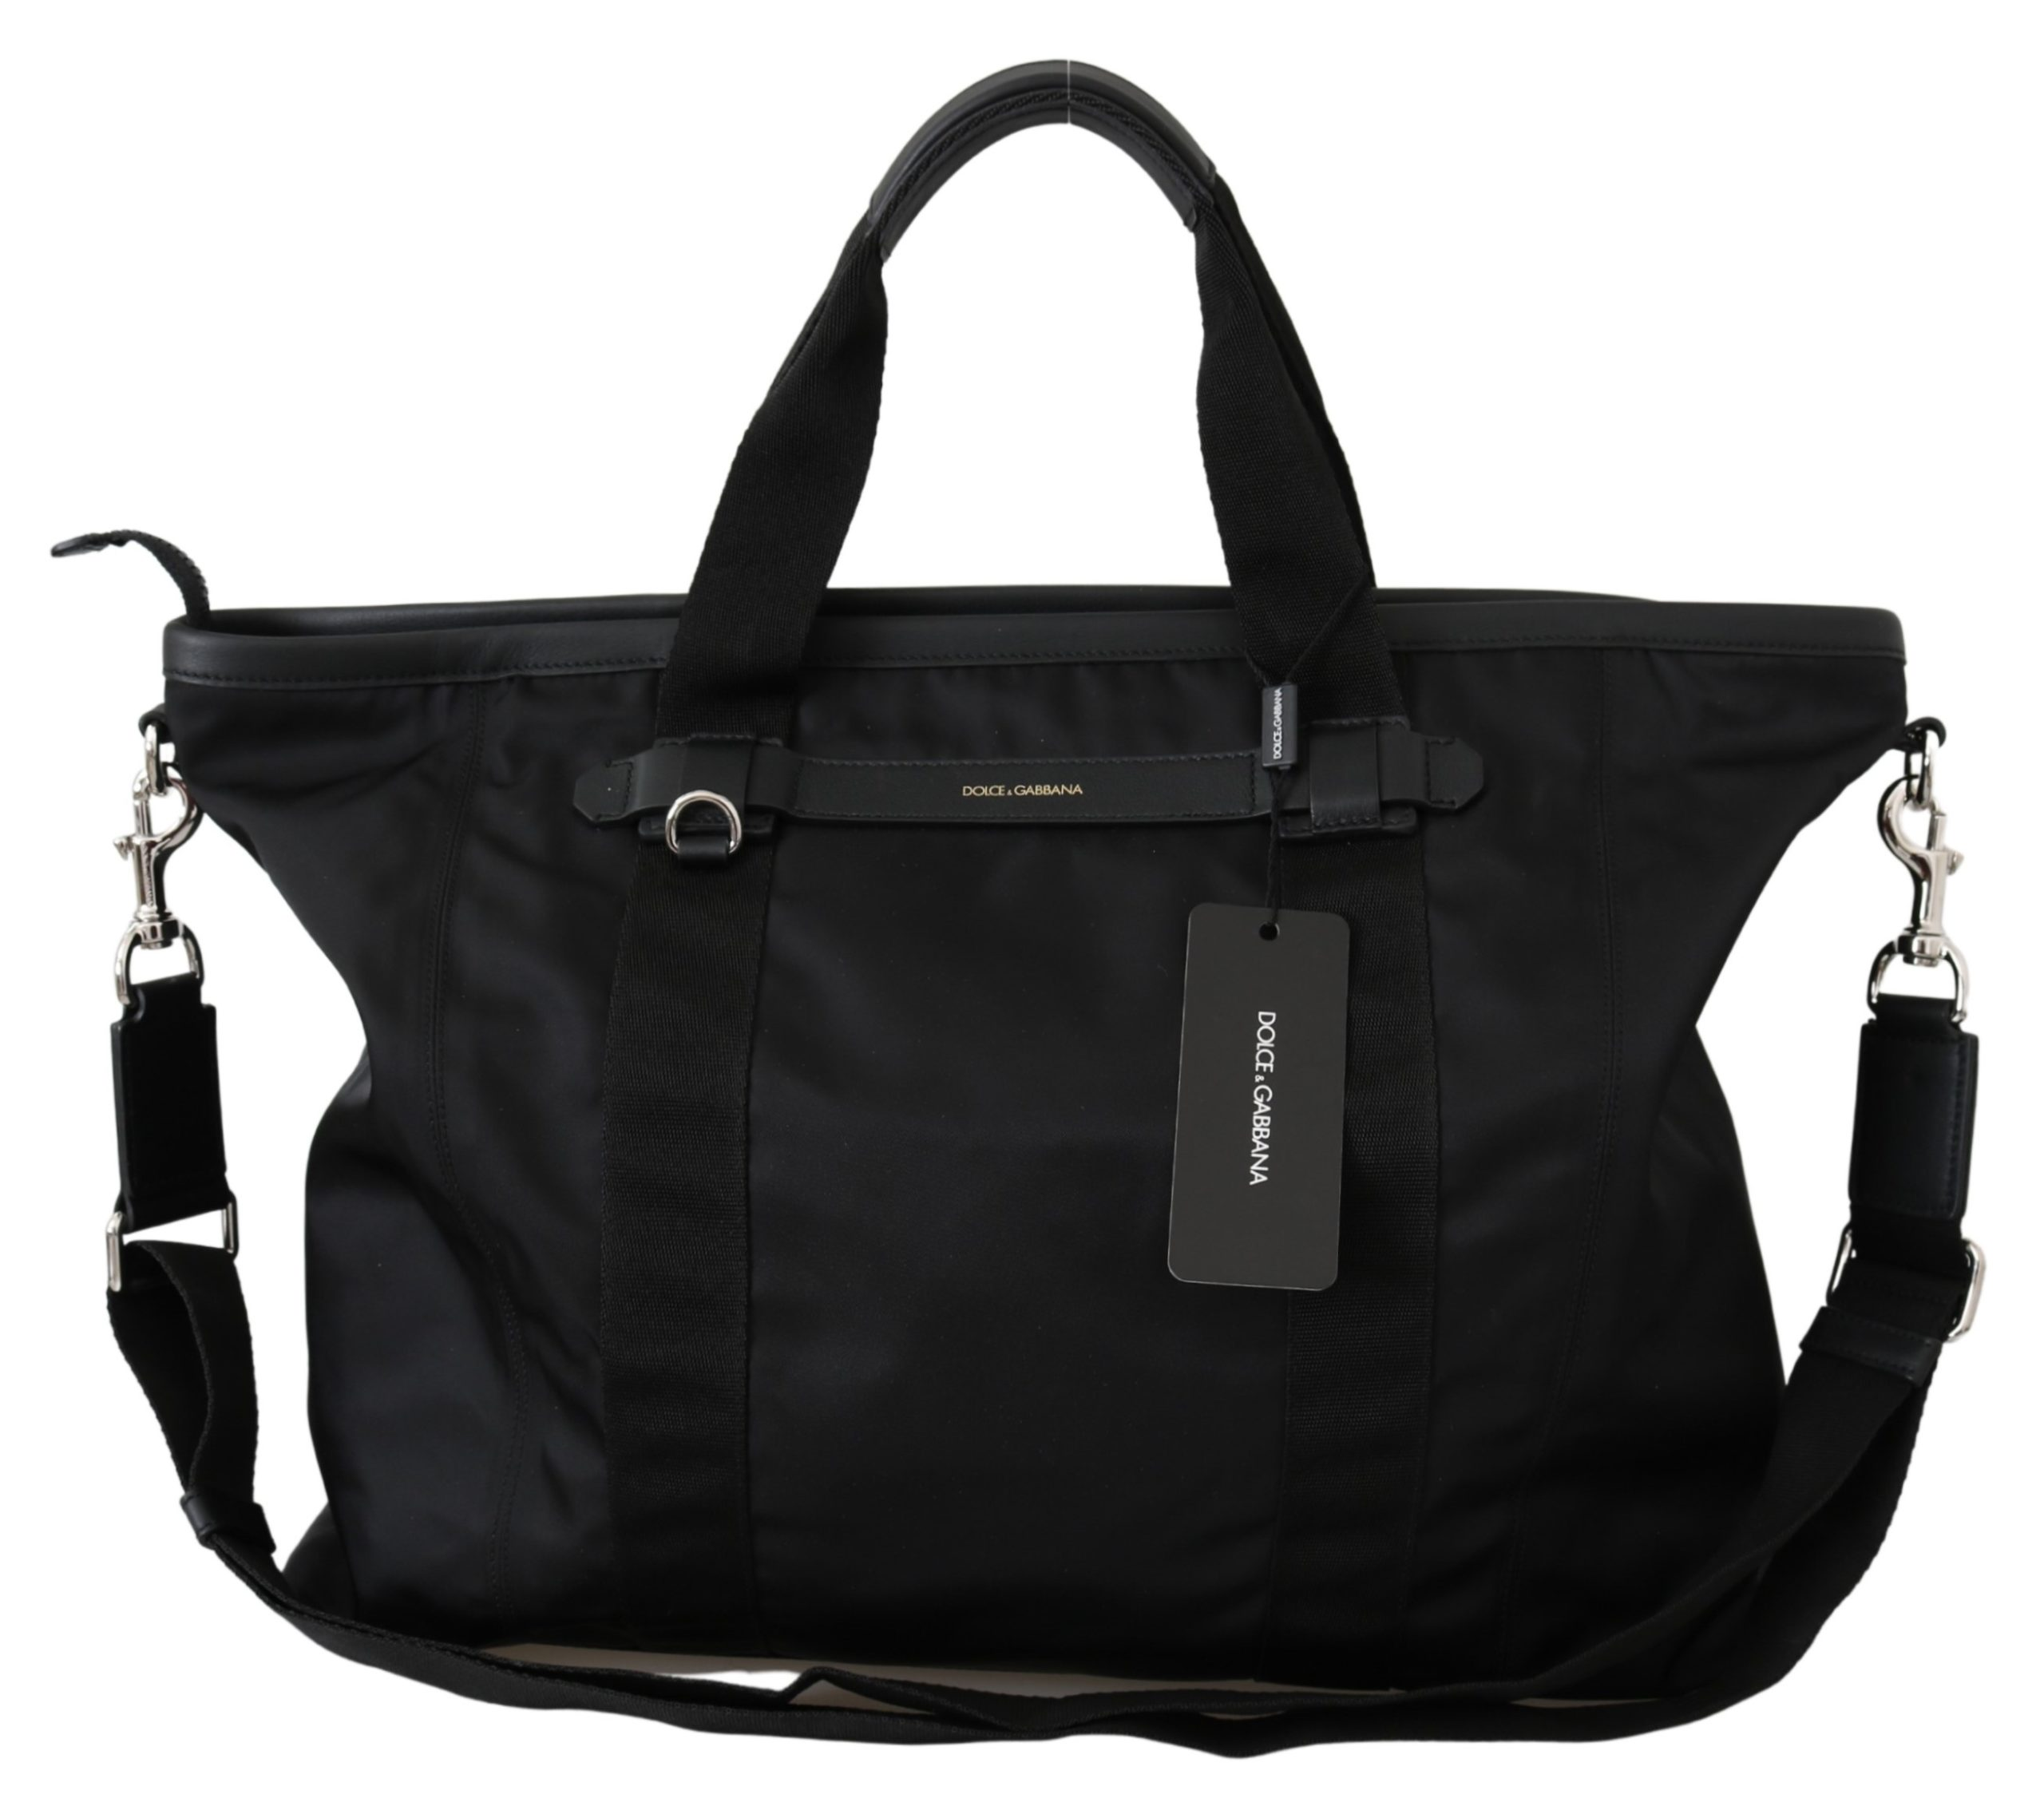 Dolce & Gabbana Men's Leather Travel Bag Black VAS9802